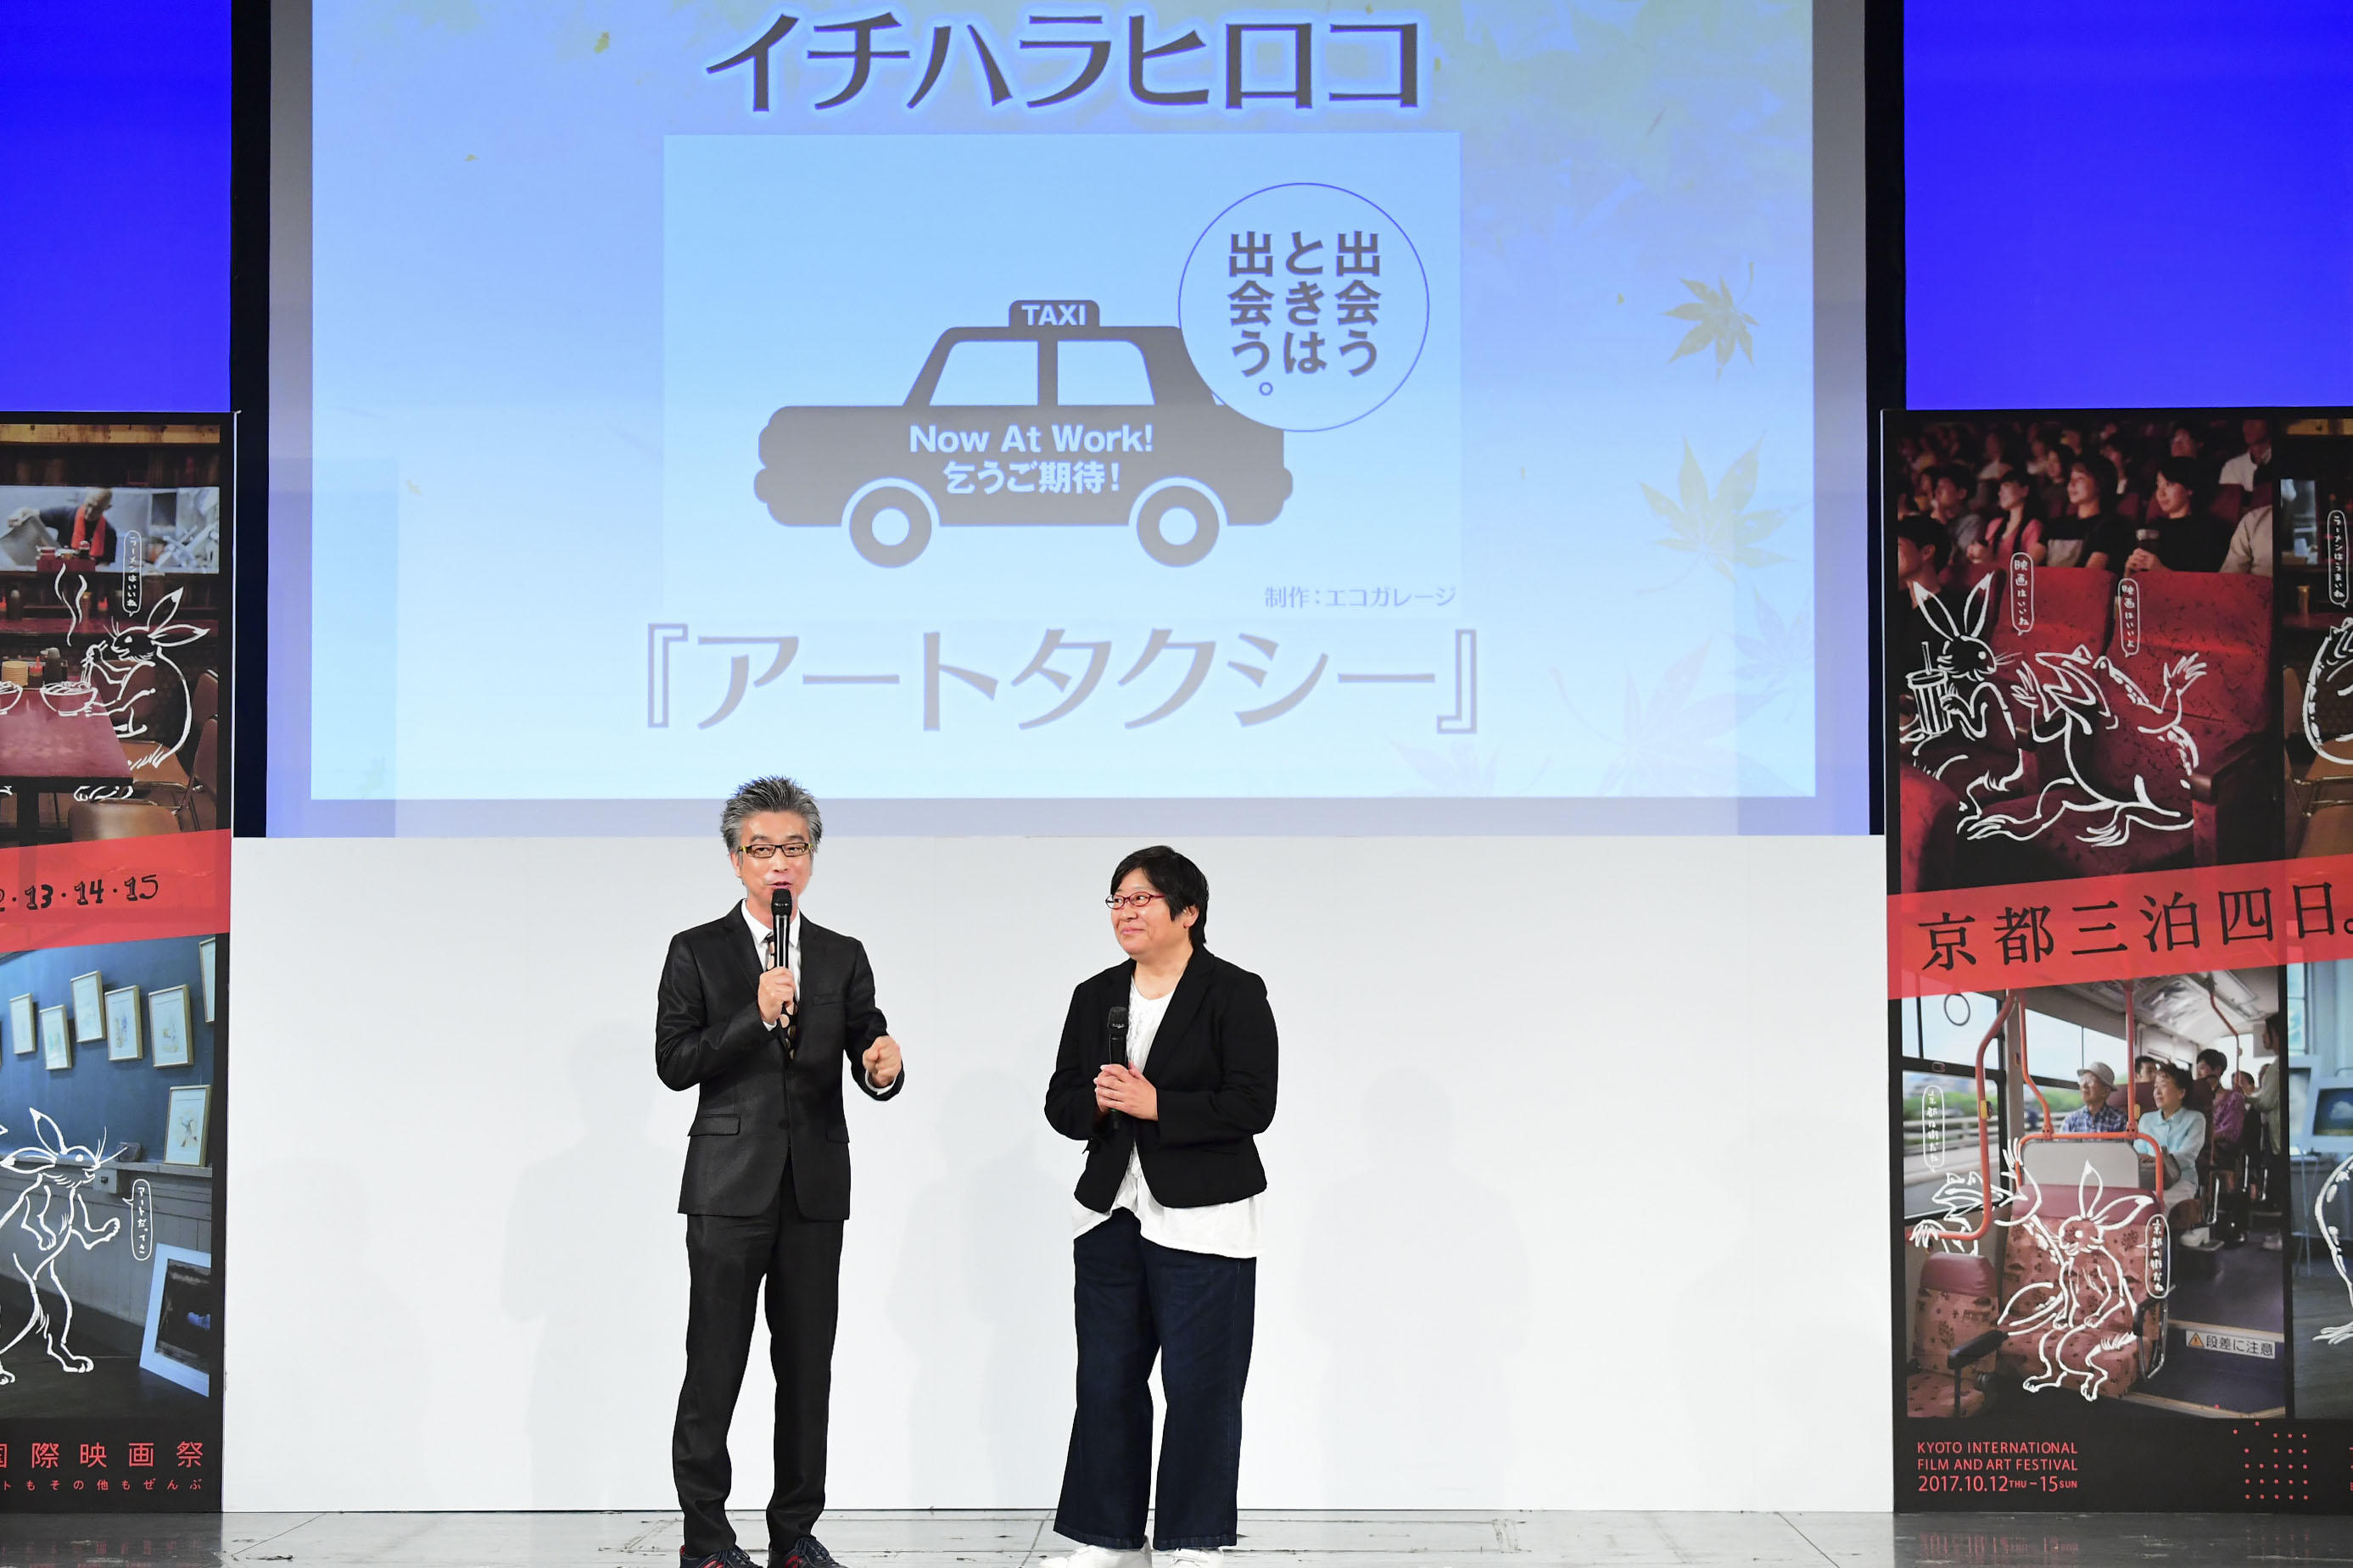 http://news.yoshimoto.co.jp/20170907021929-078ef037ed384381913441b5e5fce9ad3ca008c6.jpg